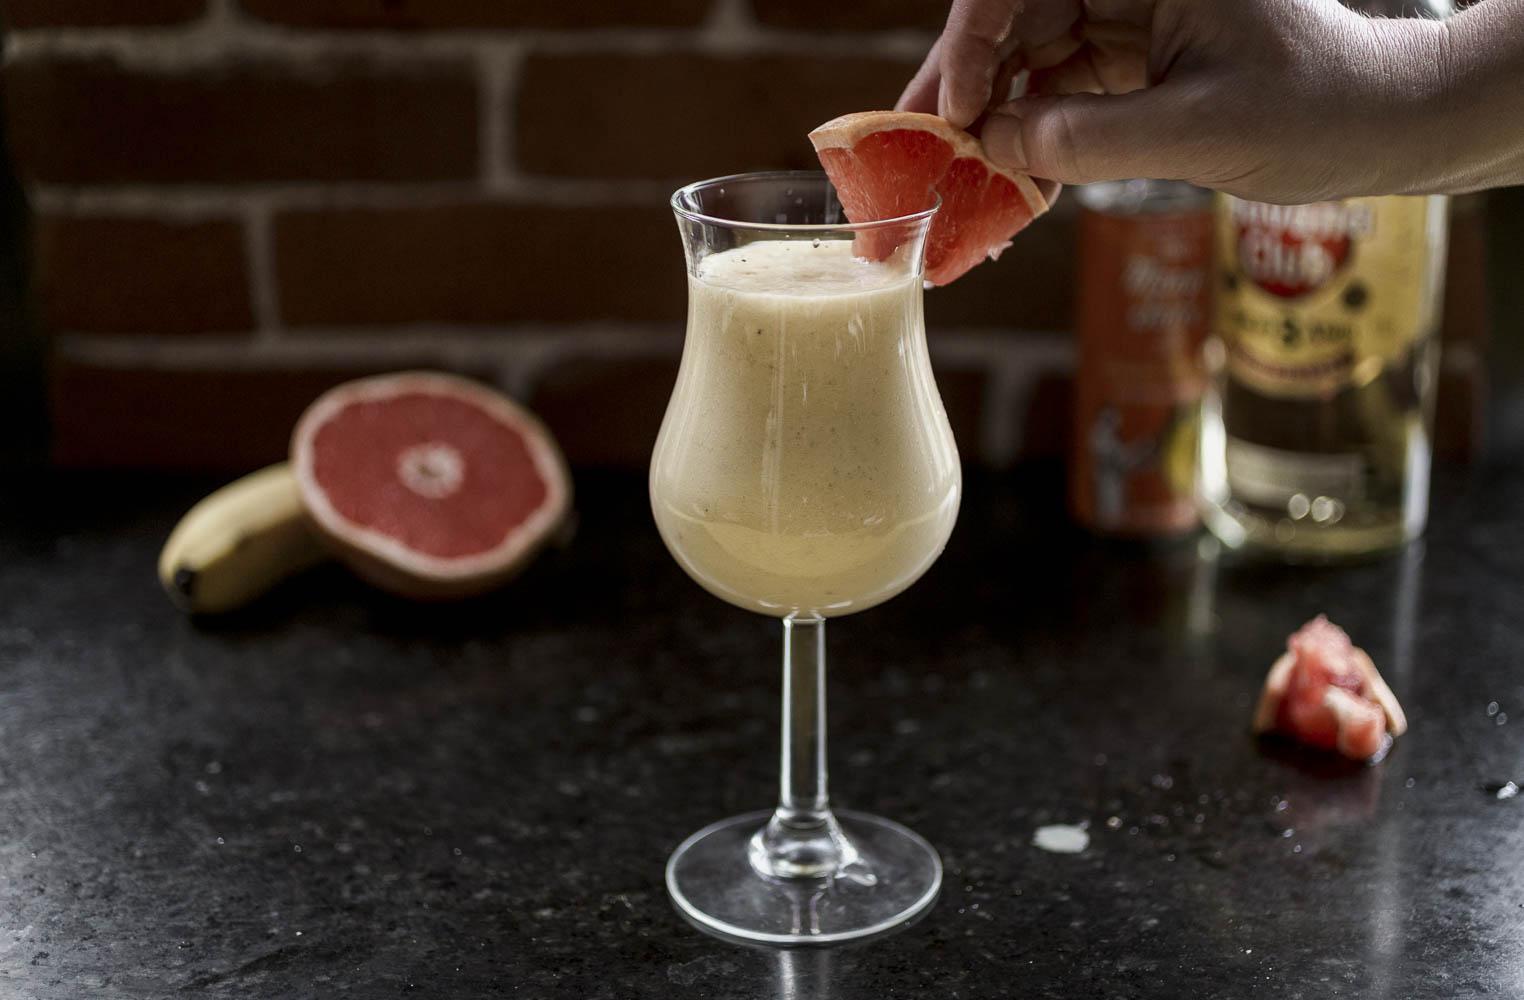 Mango Colada with banana and grapefruit